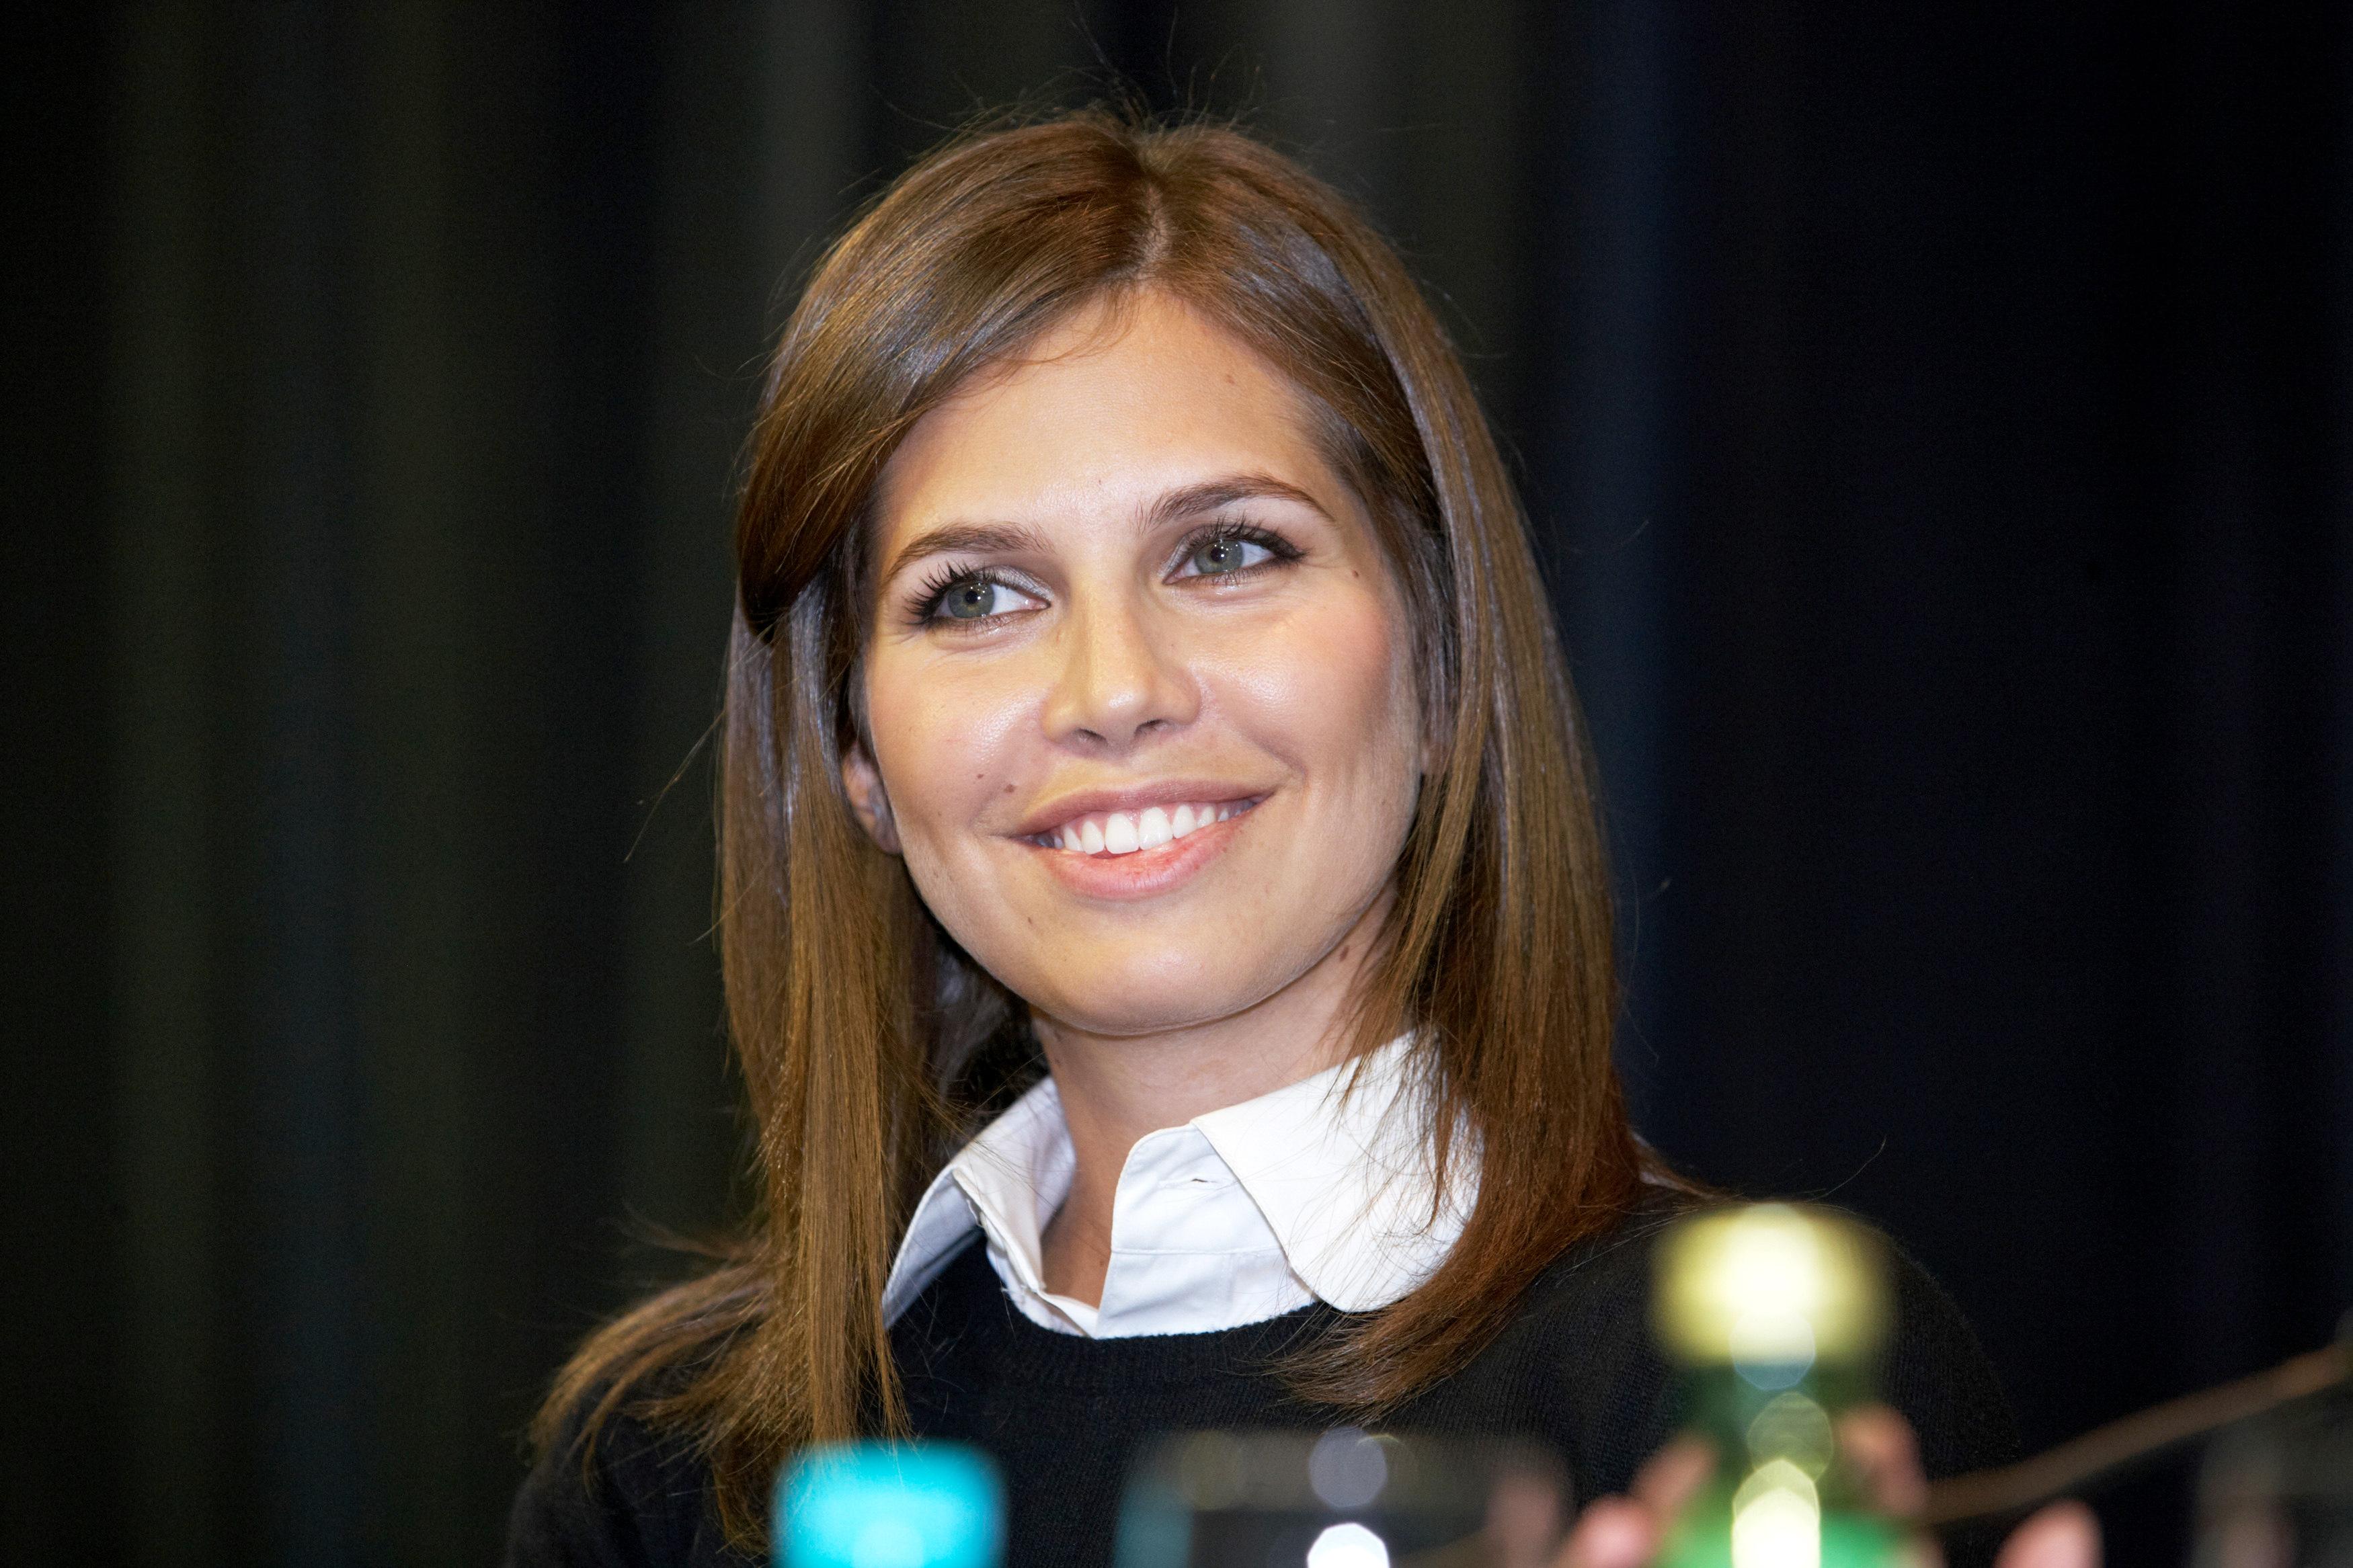 Экс-жена Абрамовича Жукова организовывала встречи Трампа с властями РФ